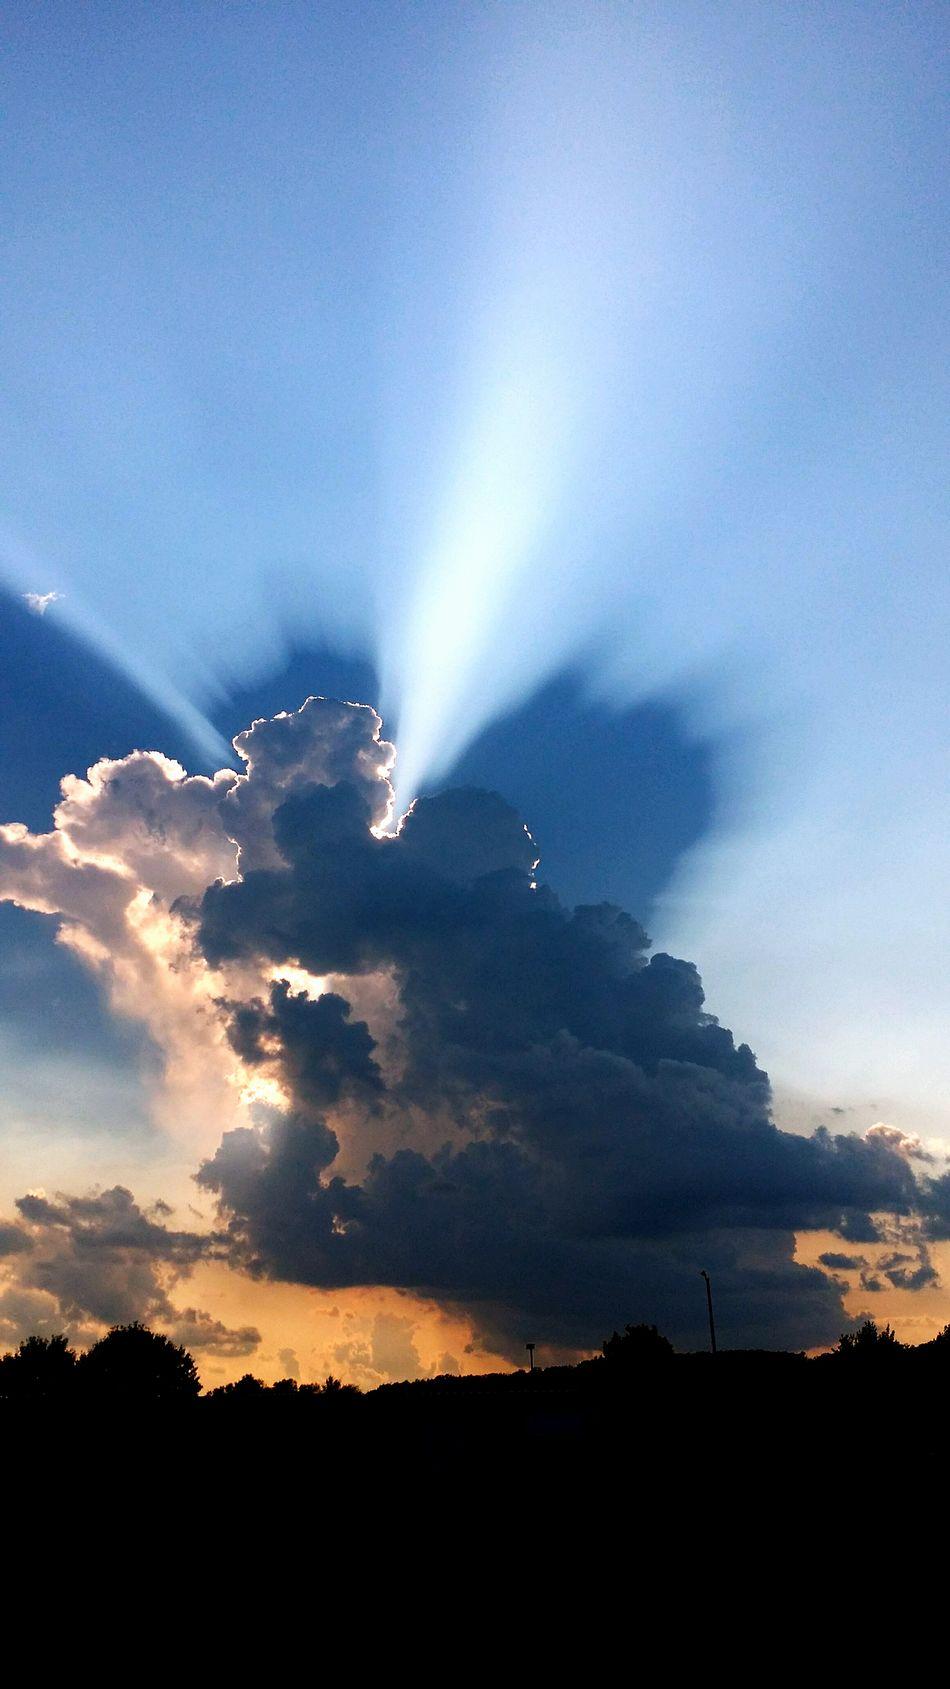 Sun light bursting through the clouds. Enjoying Life Hello World Sun&Clouds Sunset